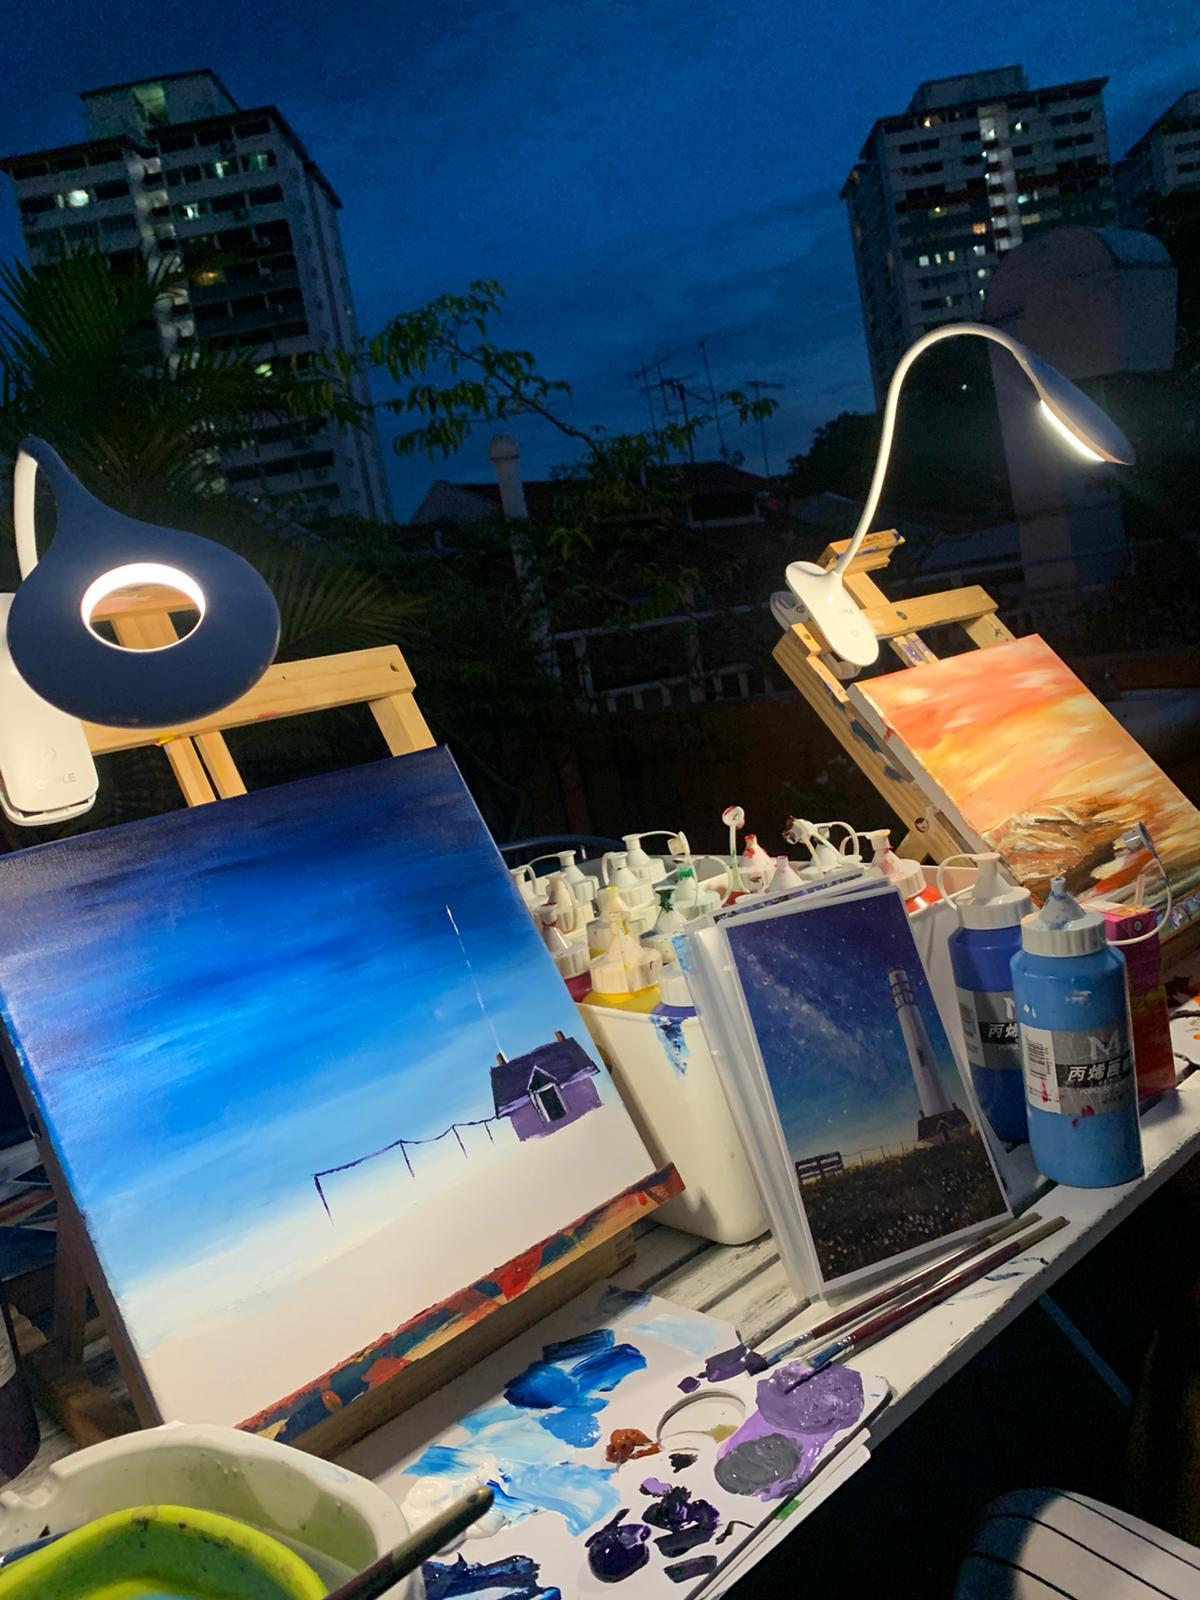 art jamming at night